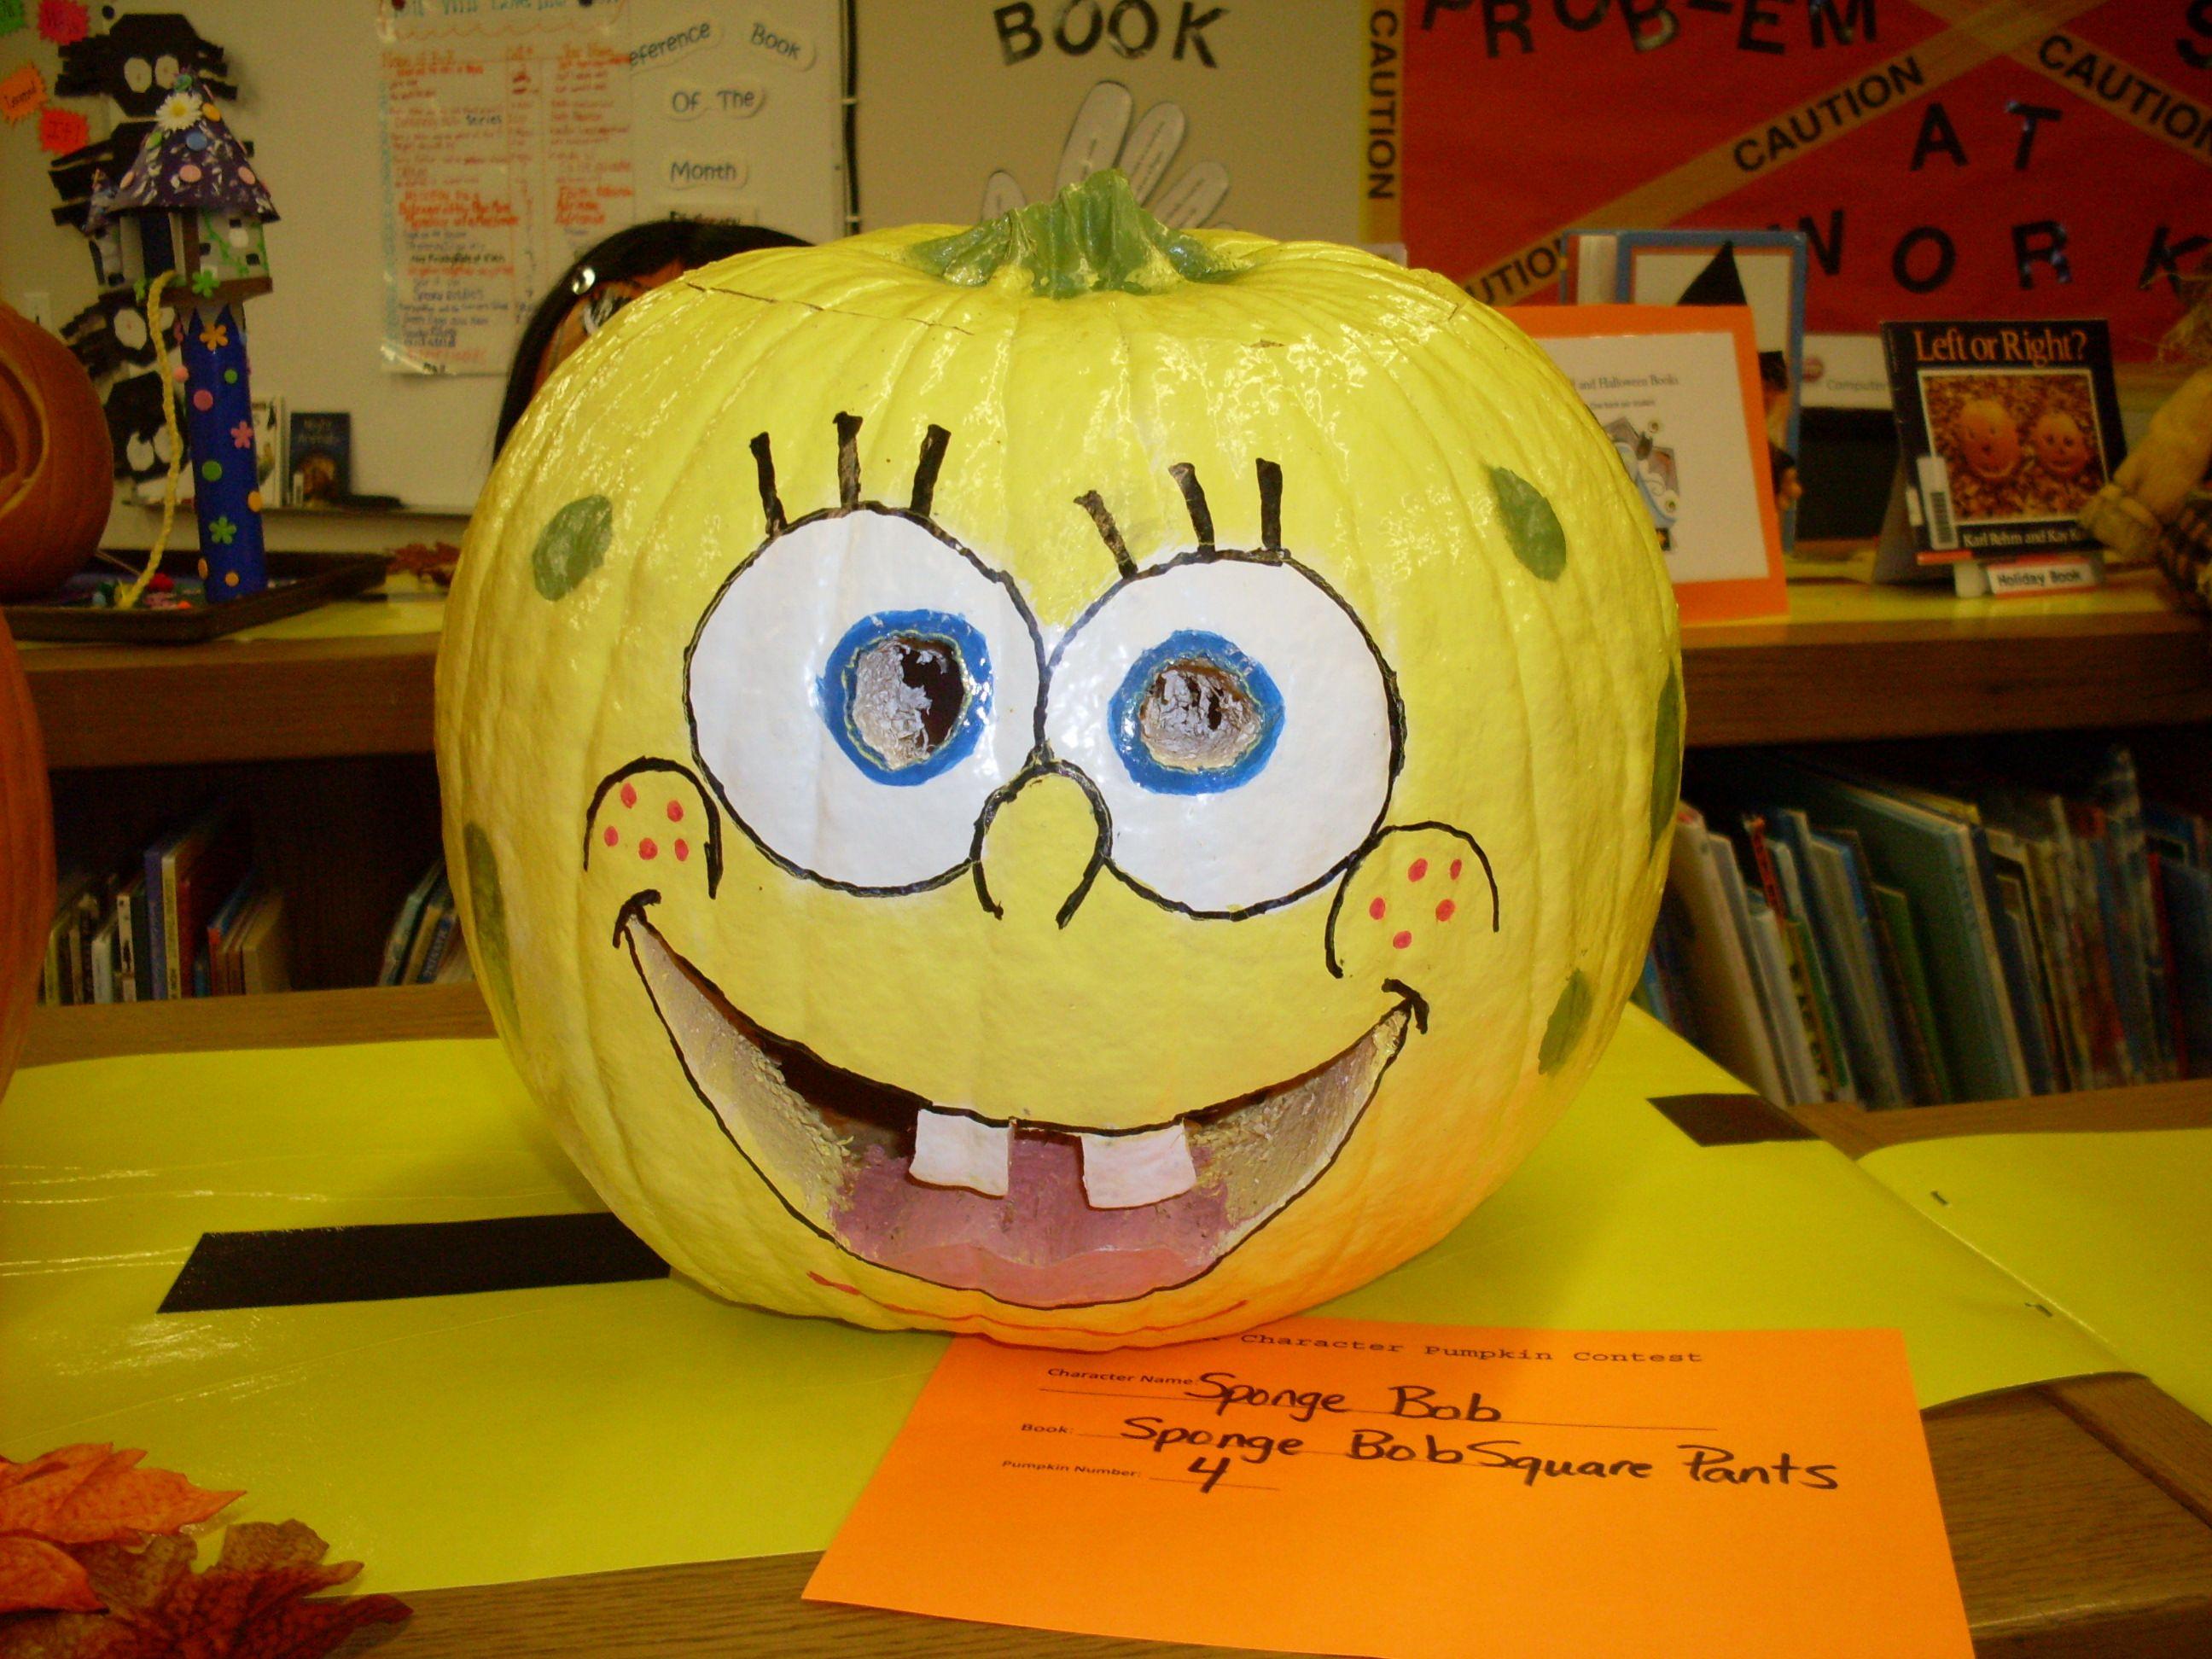 Book Character Pumpkin Decorating Contest We Know How To Do It Book Character Pumpkins Pumpkin Decorating Pumpkin Decorating Contest